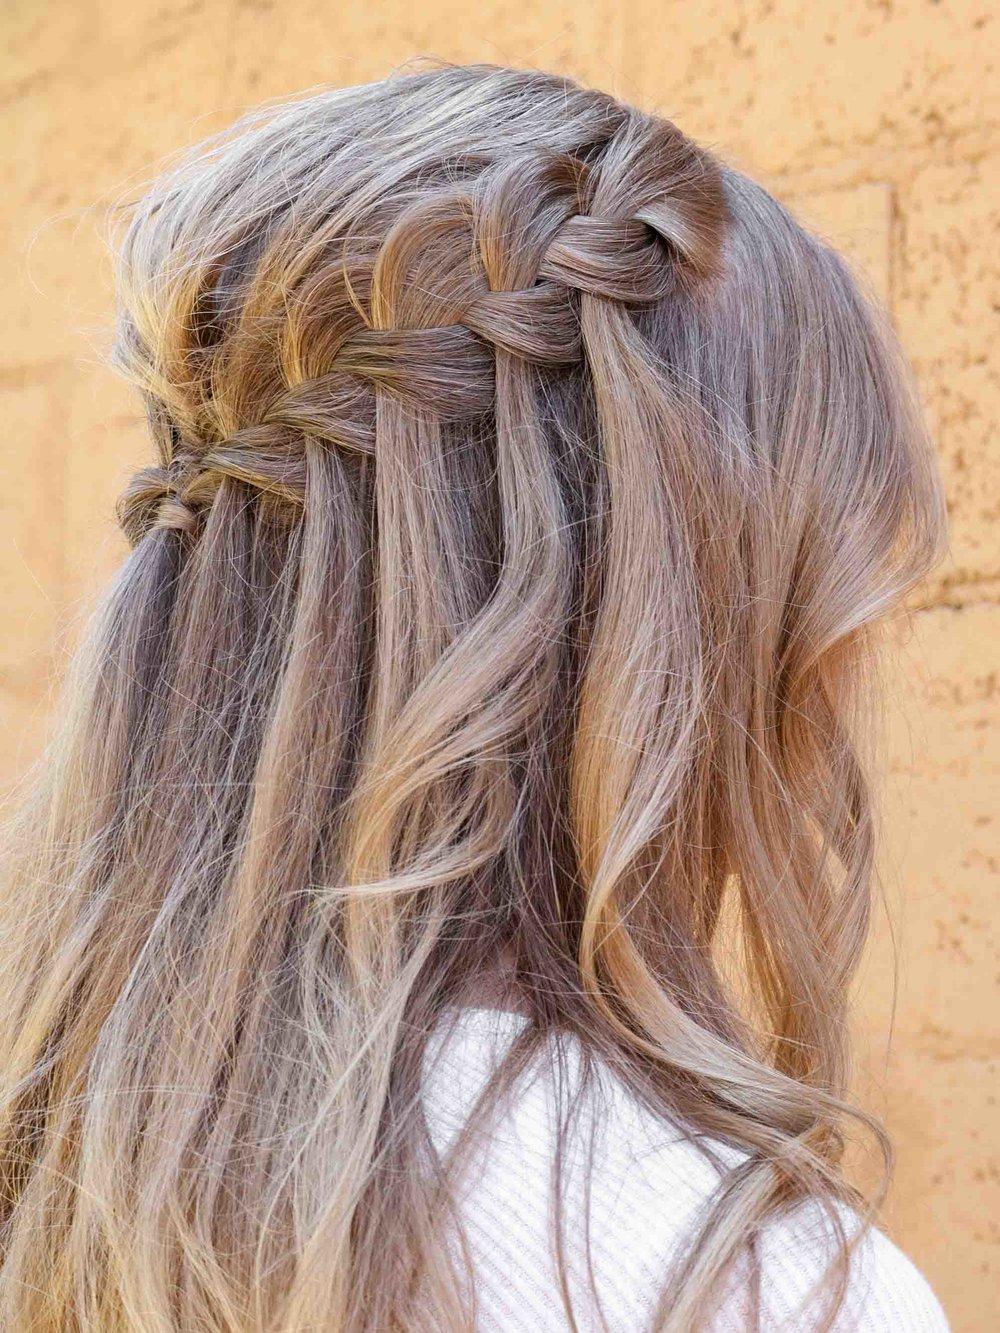 talia-whatcott-makeup-artist-portfolio-blog-hair-waterfall-braid-smoky-eye-matte-lip-bridal-wedding-tousled-curls-1-2.jpg